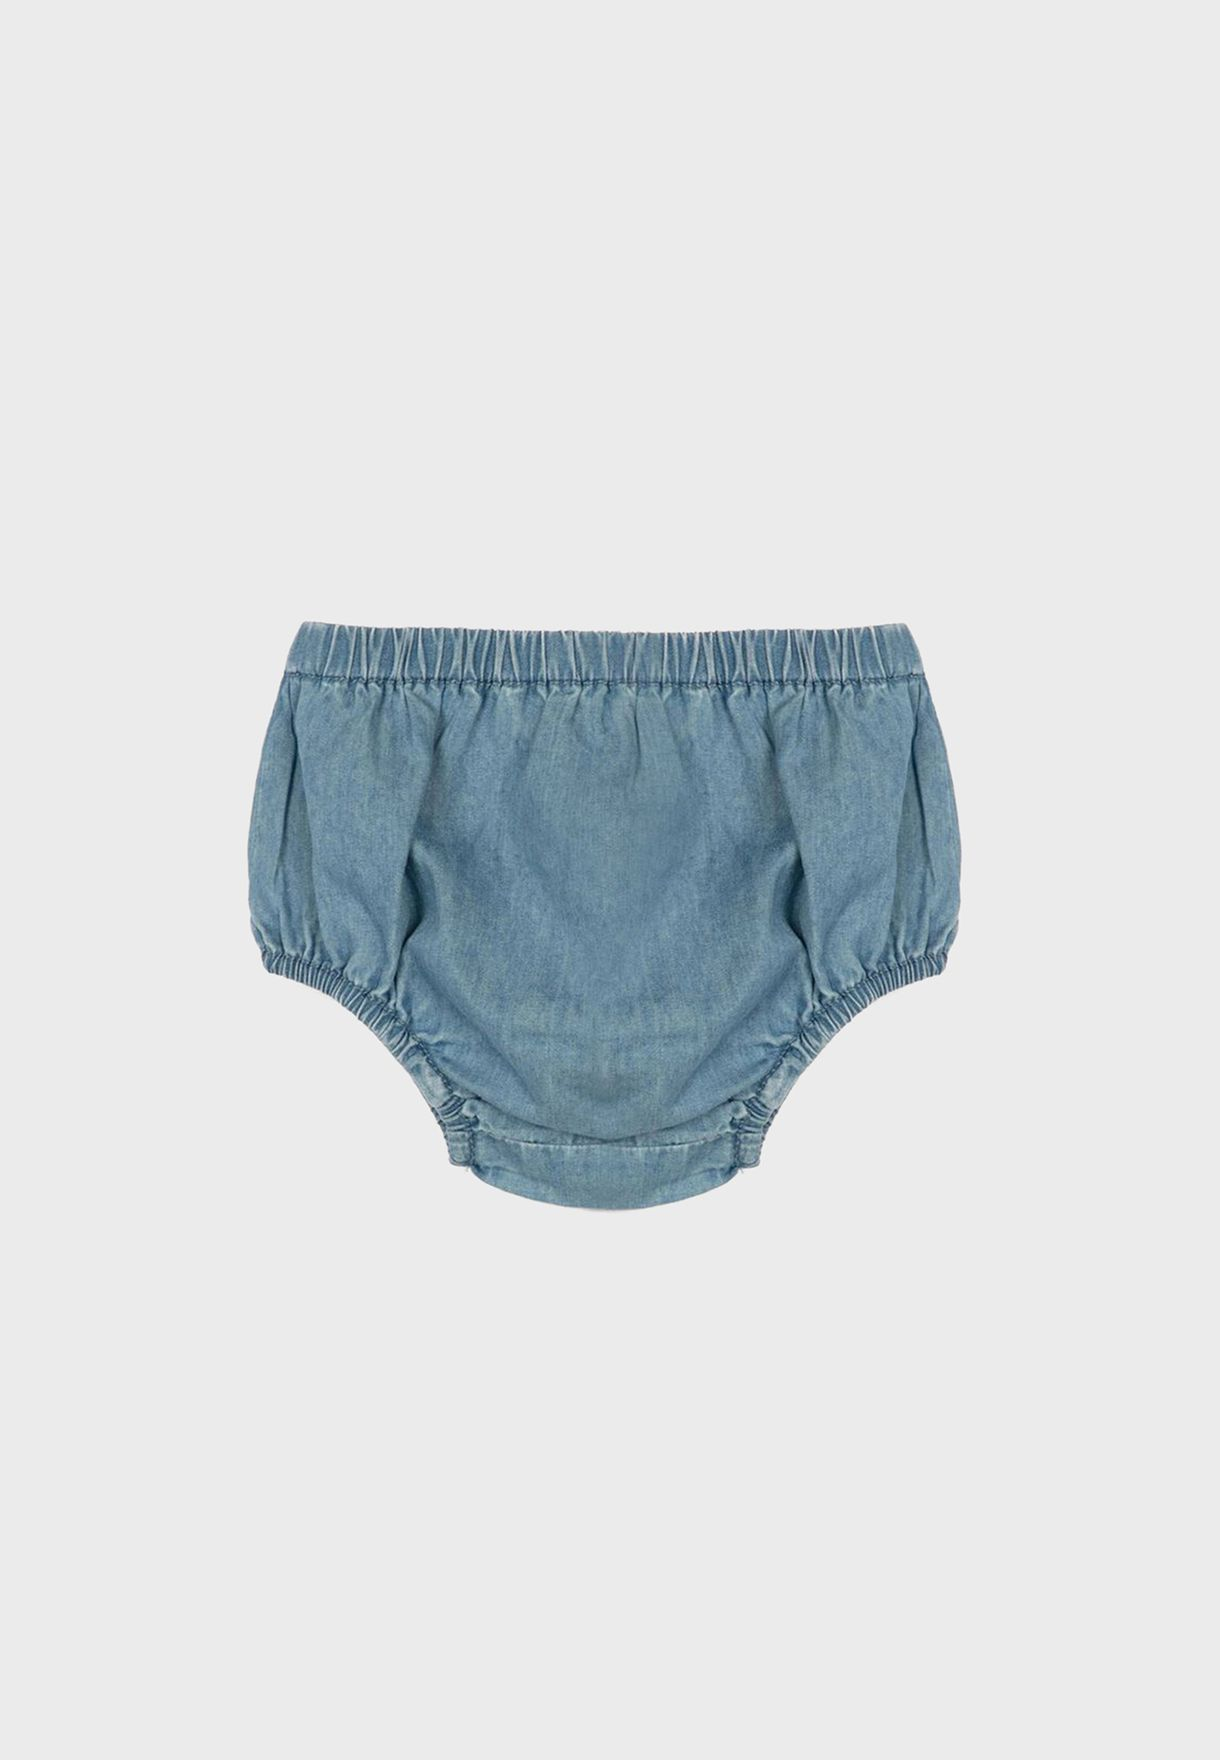 Infant Denim Dress + Knicker Set